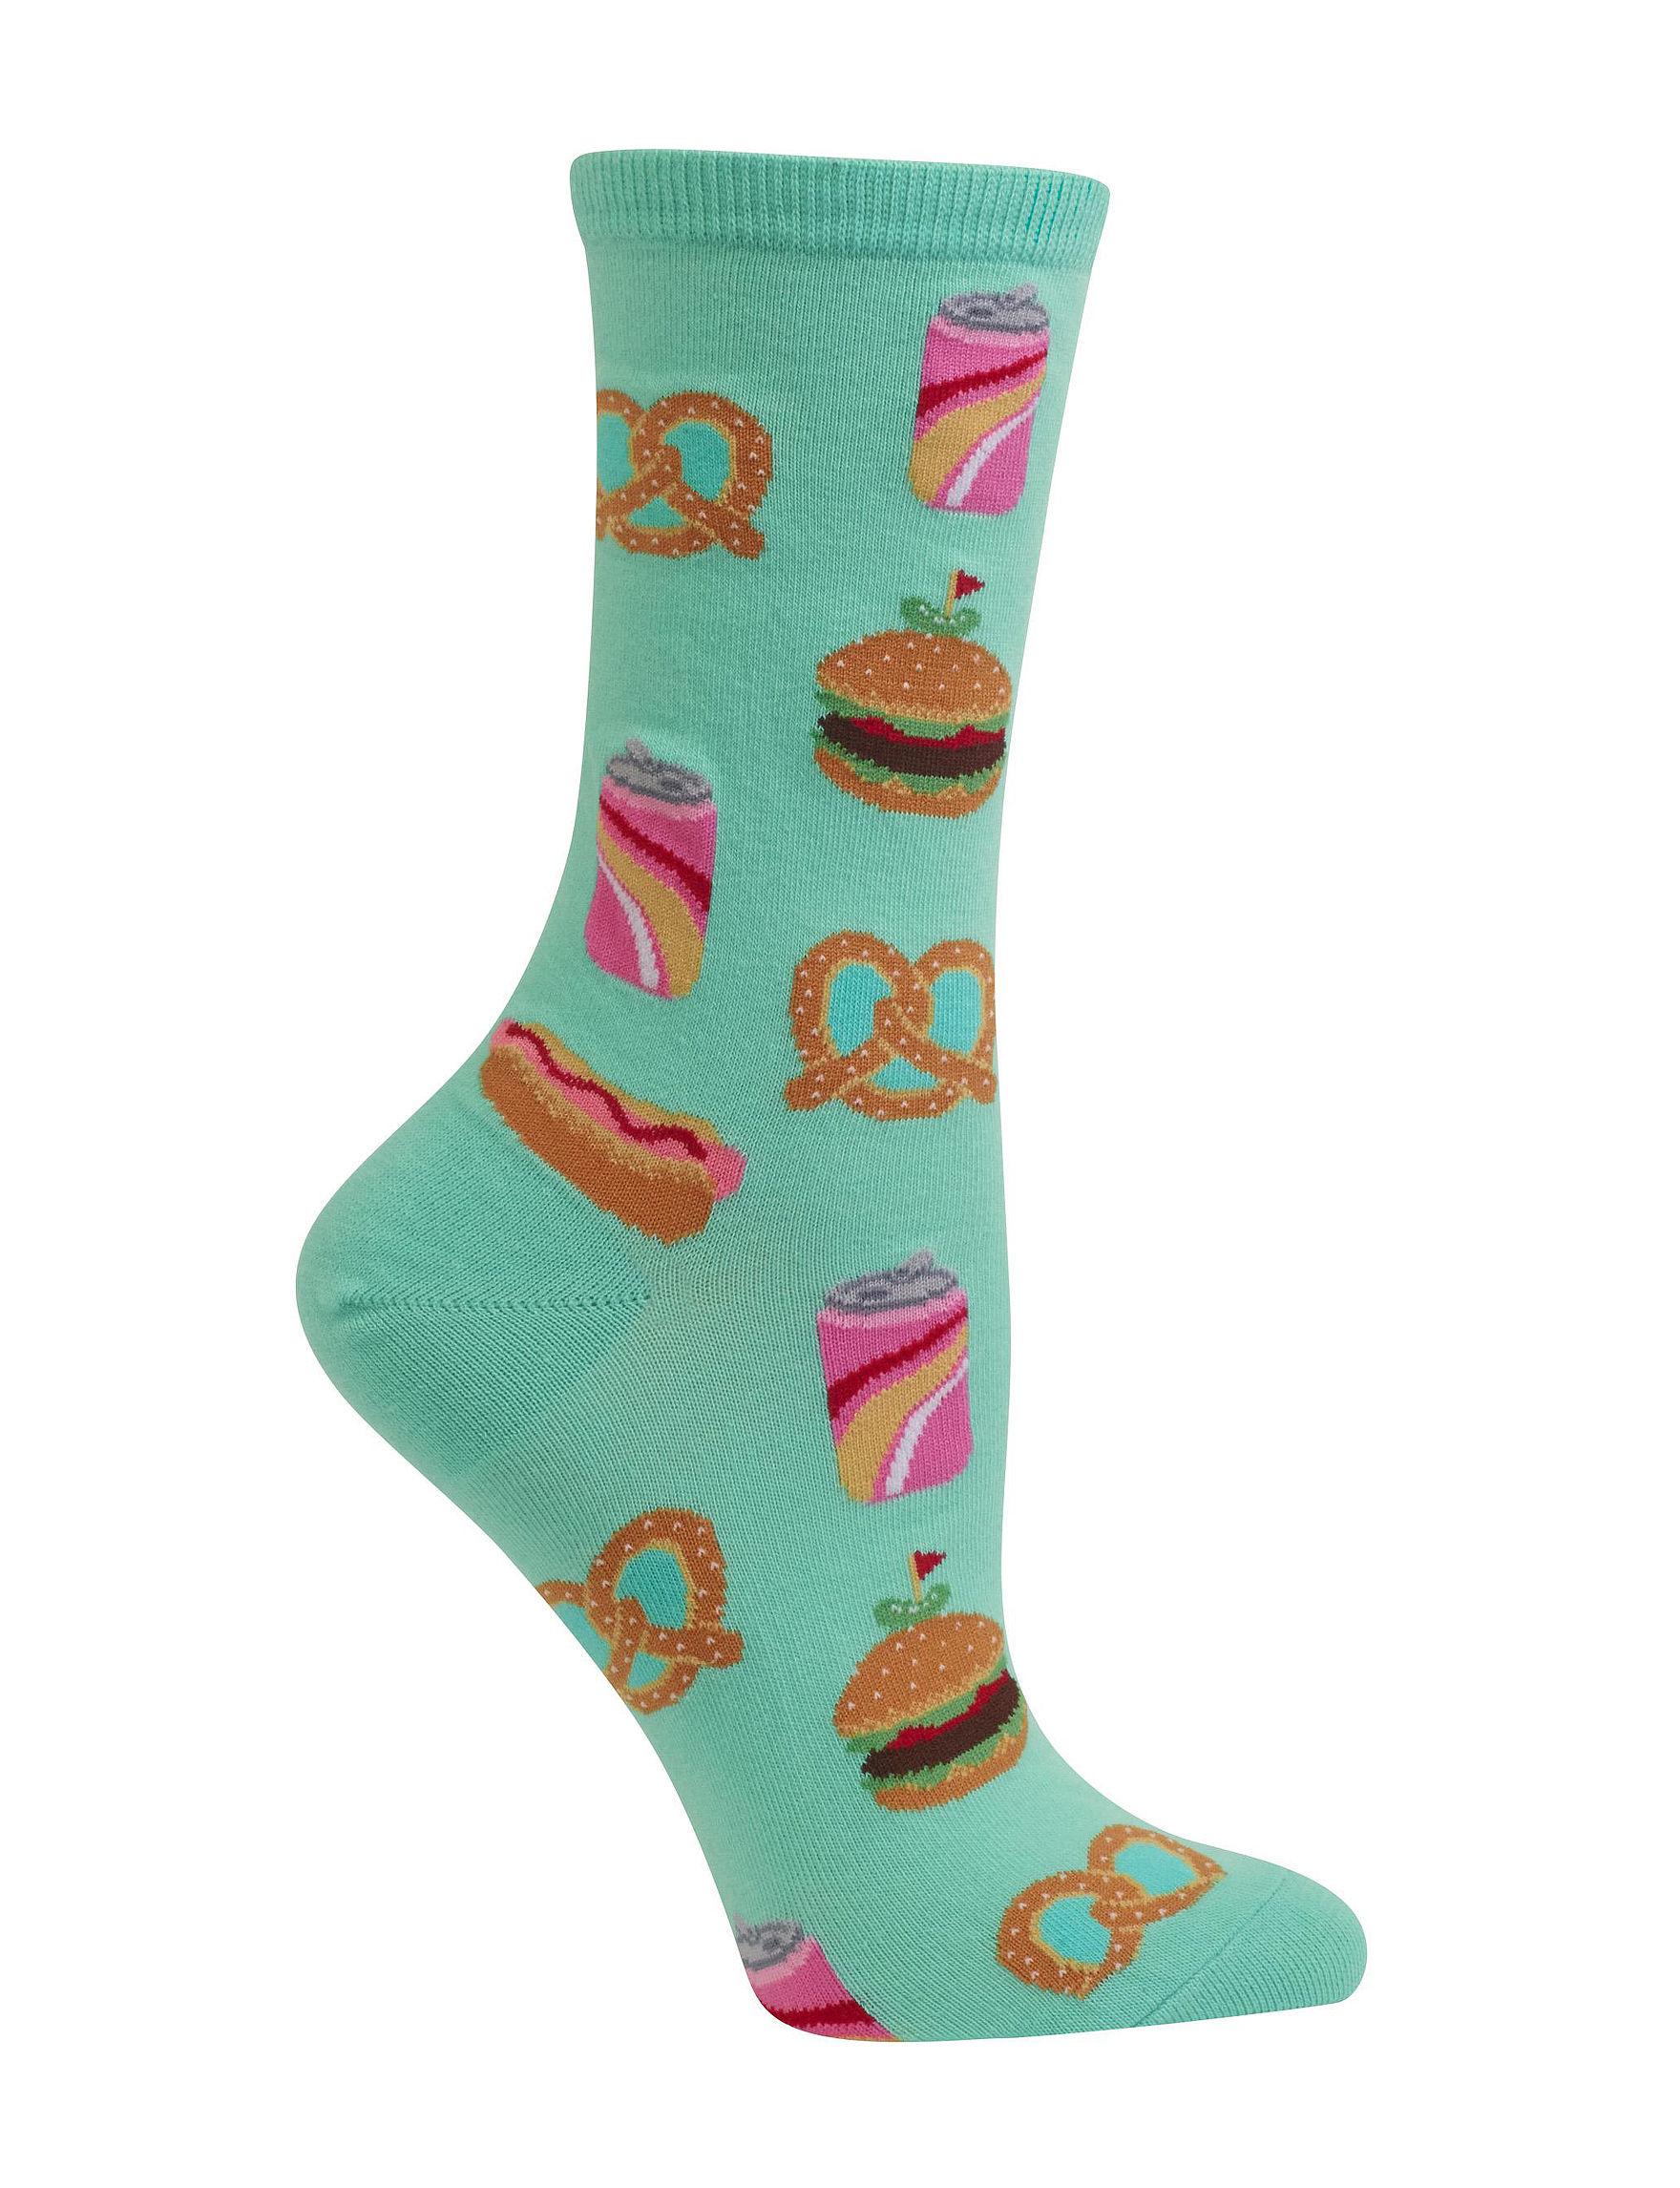 Hot Sox Mint Socks